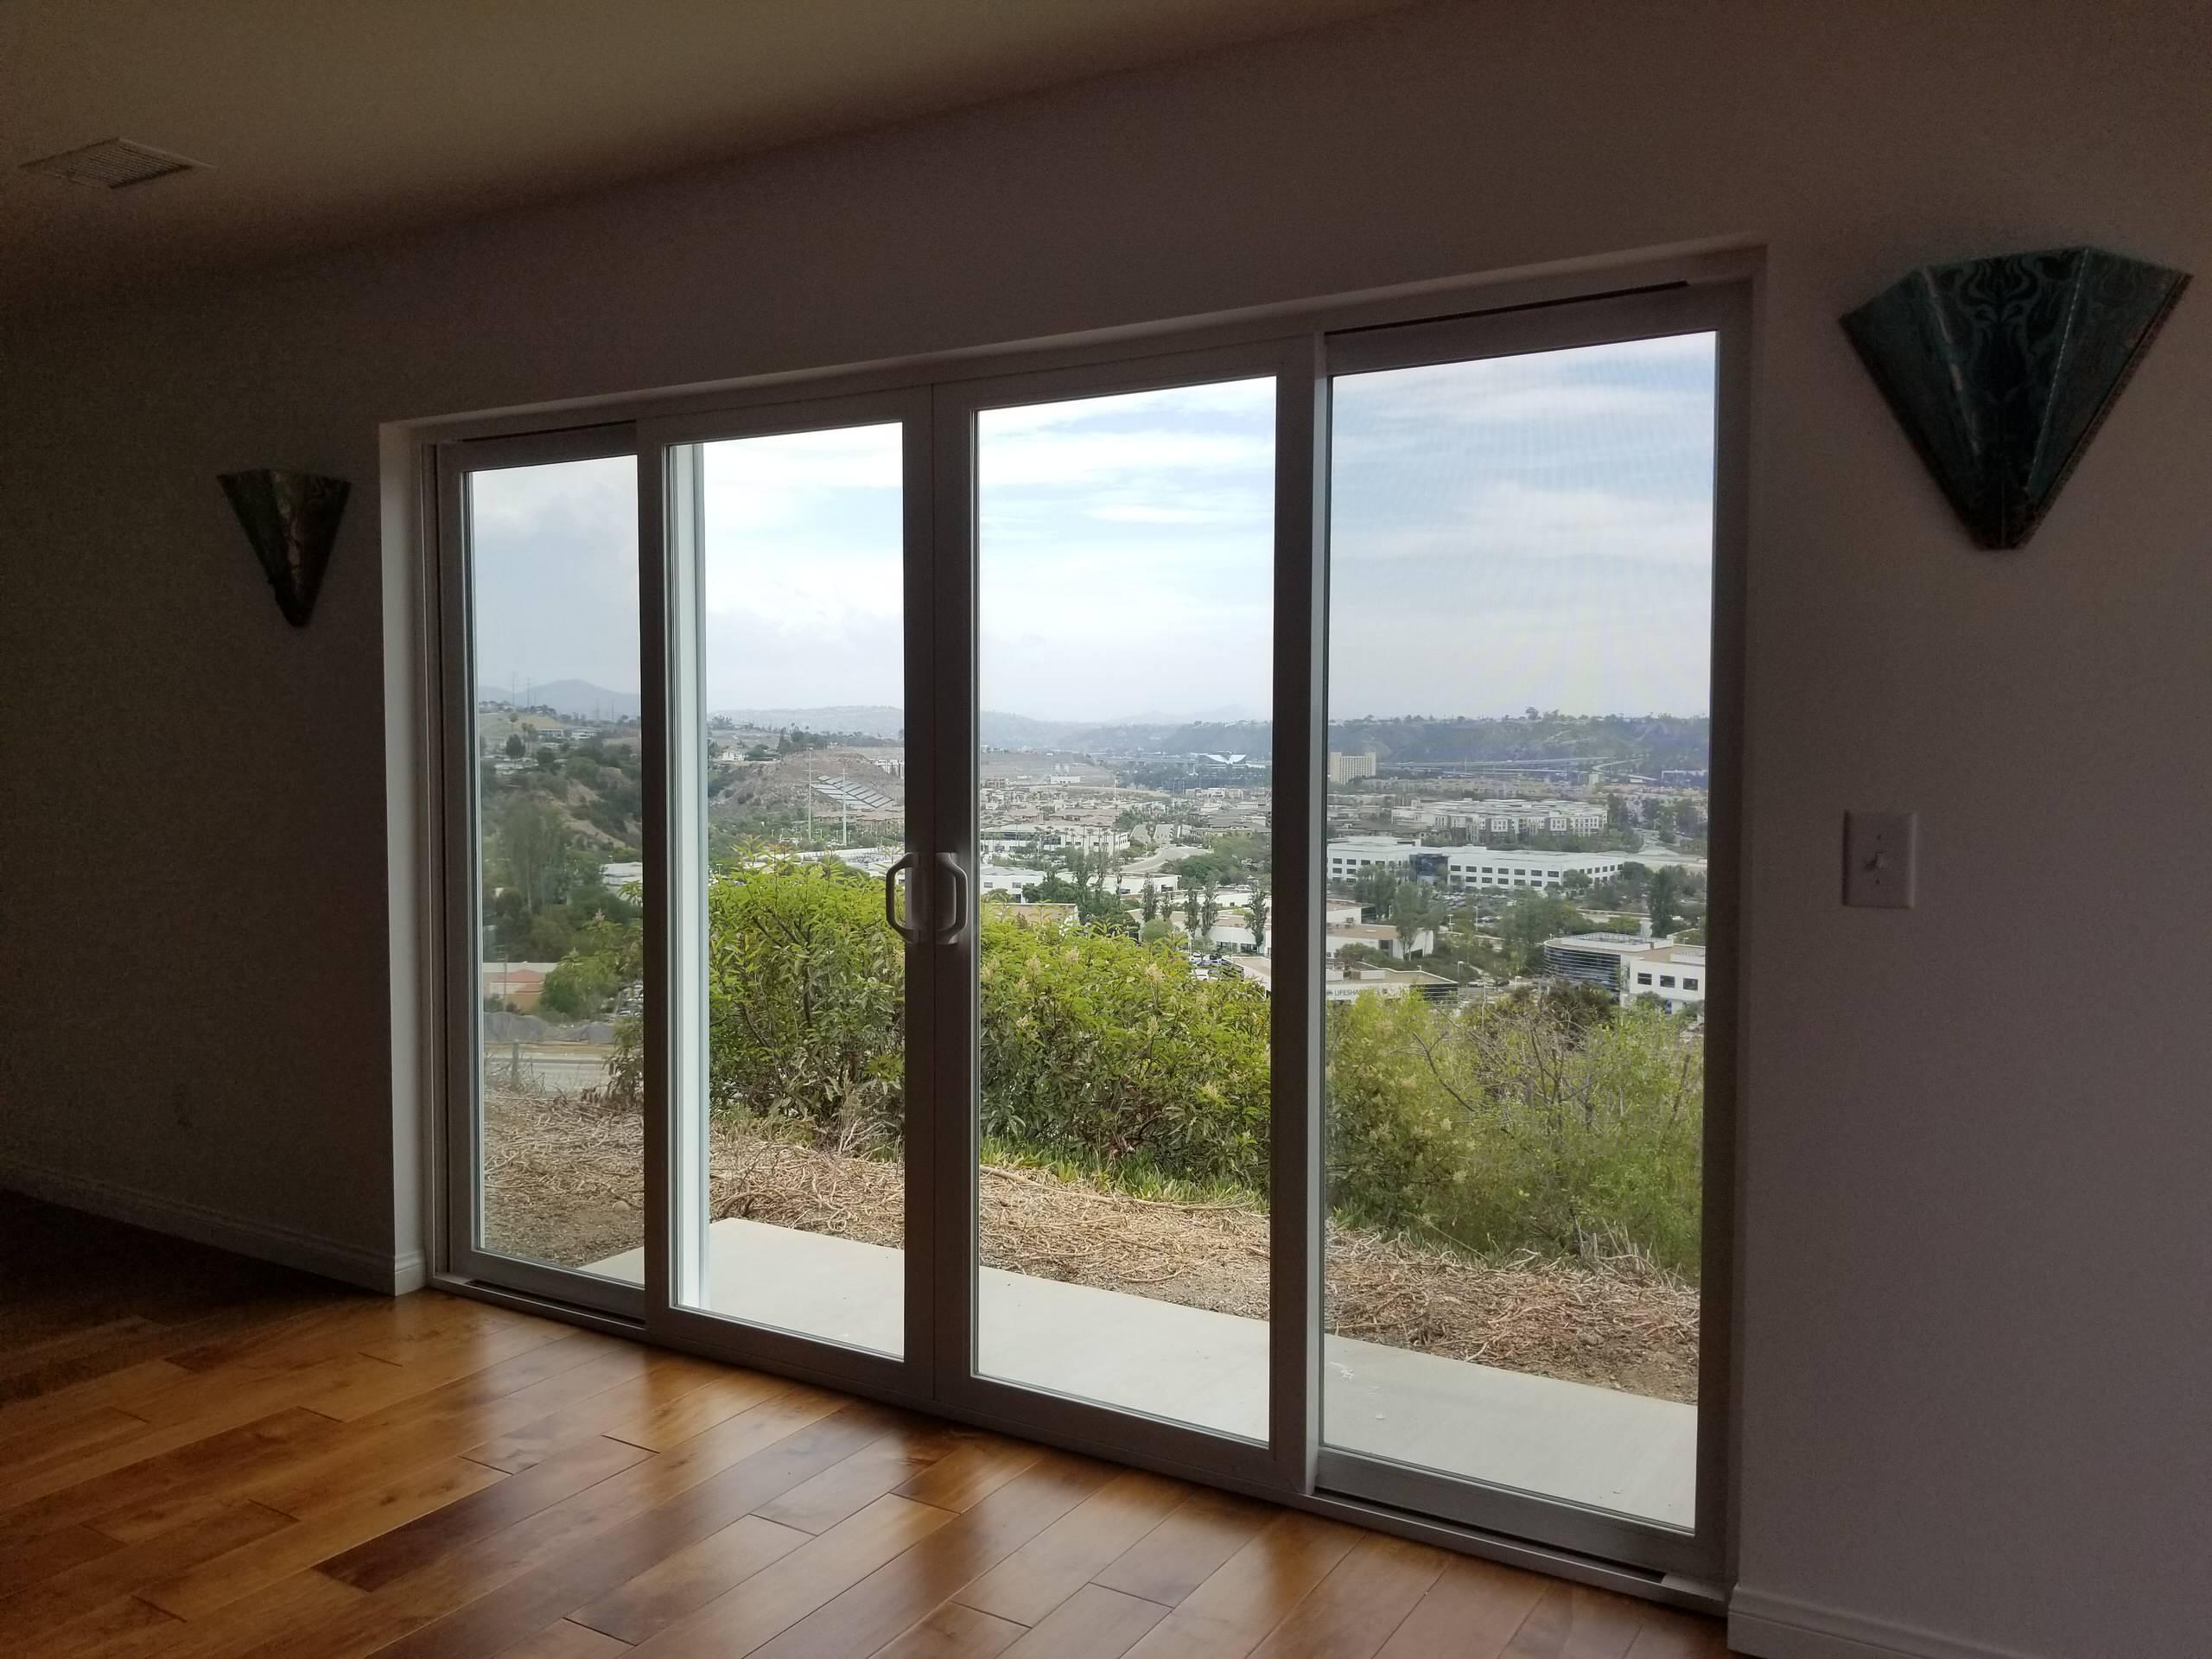 Linda Vista Canyon Views Master Suite Addition!